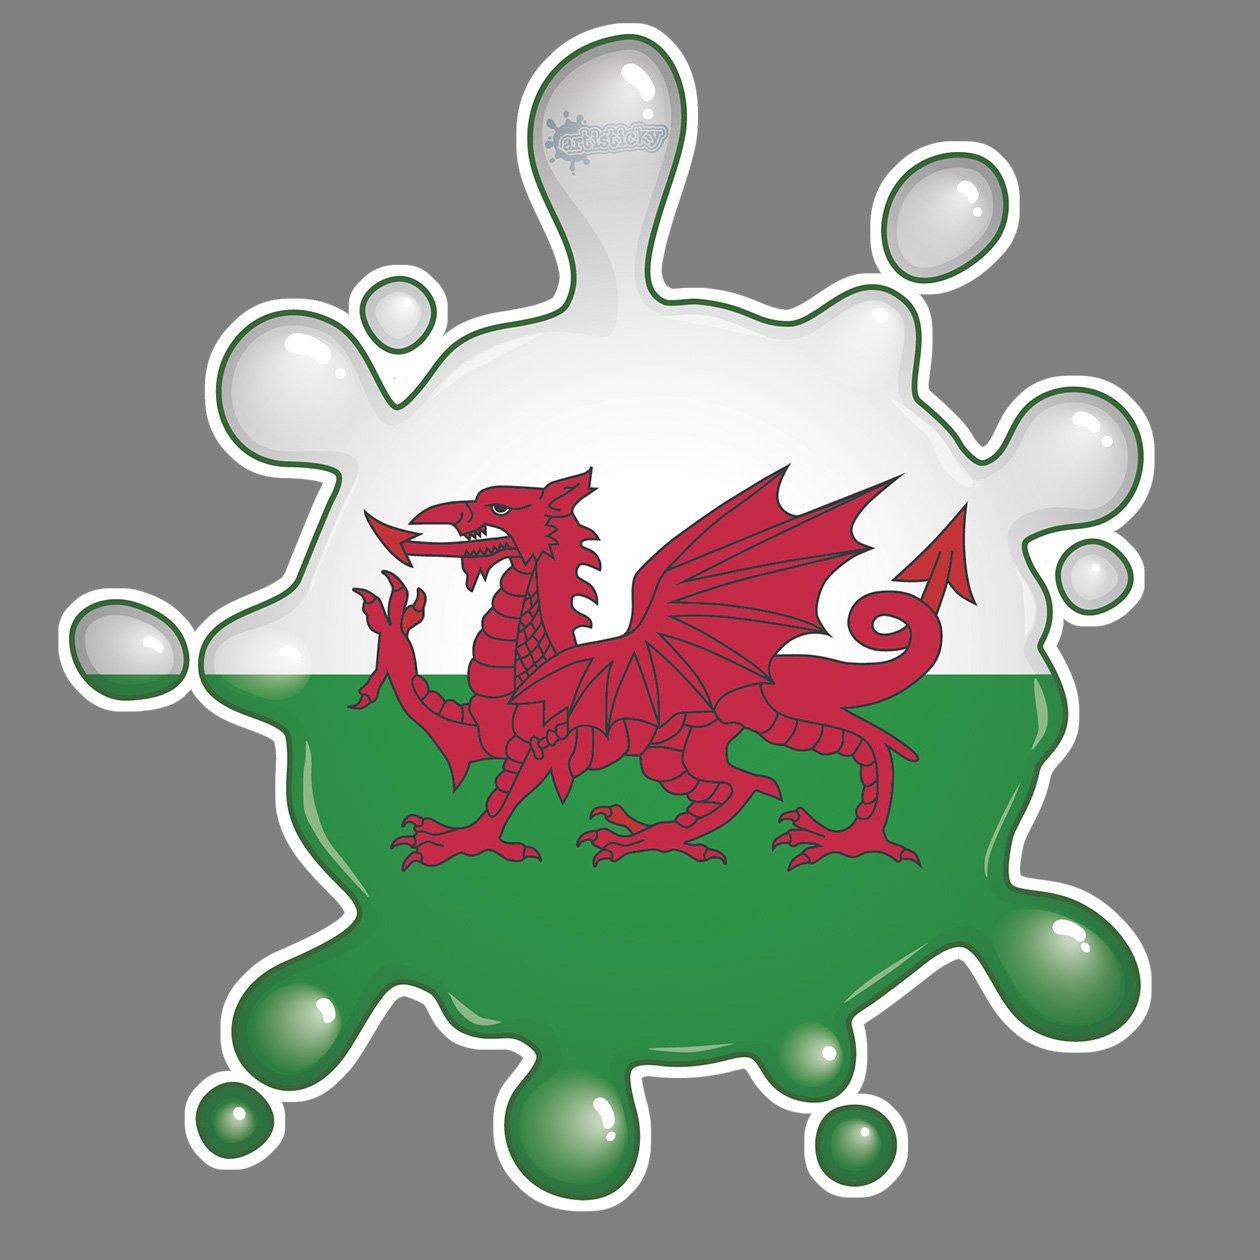 Wales Flag Splat FREE UK POSTAGE Parking Permit Holder Skin